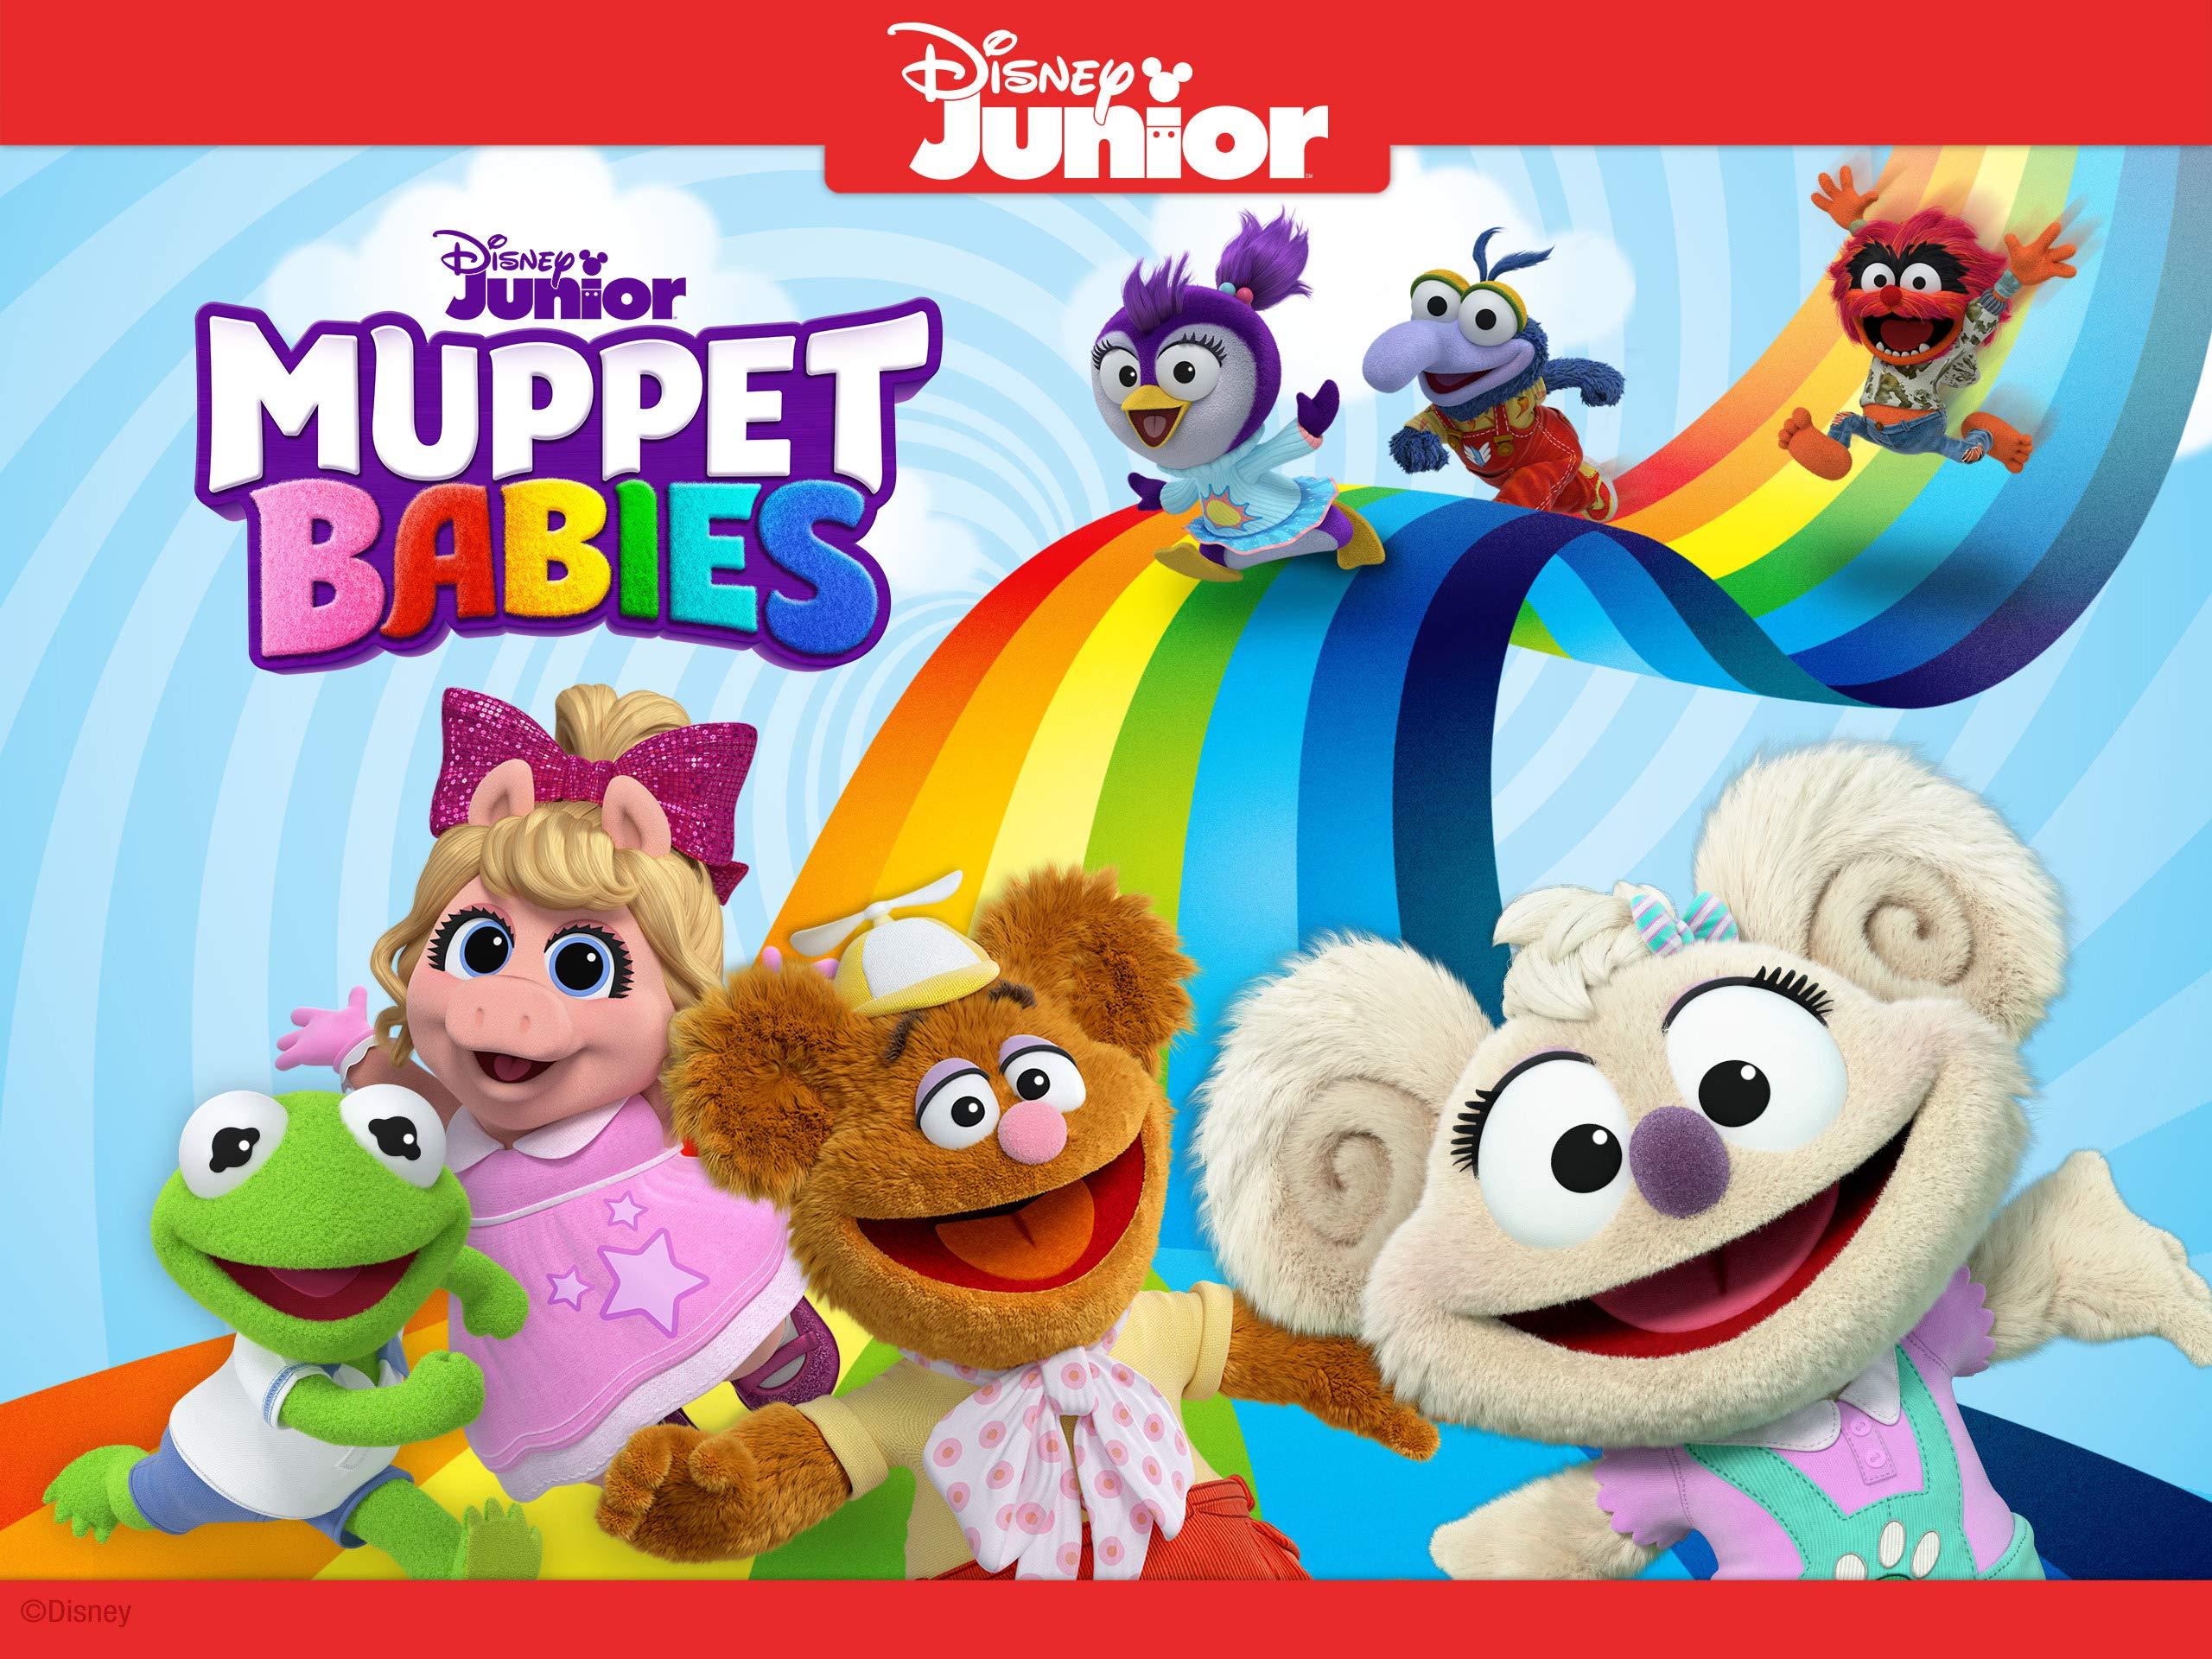 Muppet Babies 2021 A Very Muppet Babies Christmas Watch Muppet Babies Volume 5 Prime Video